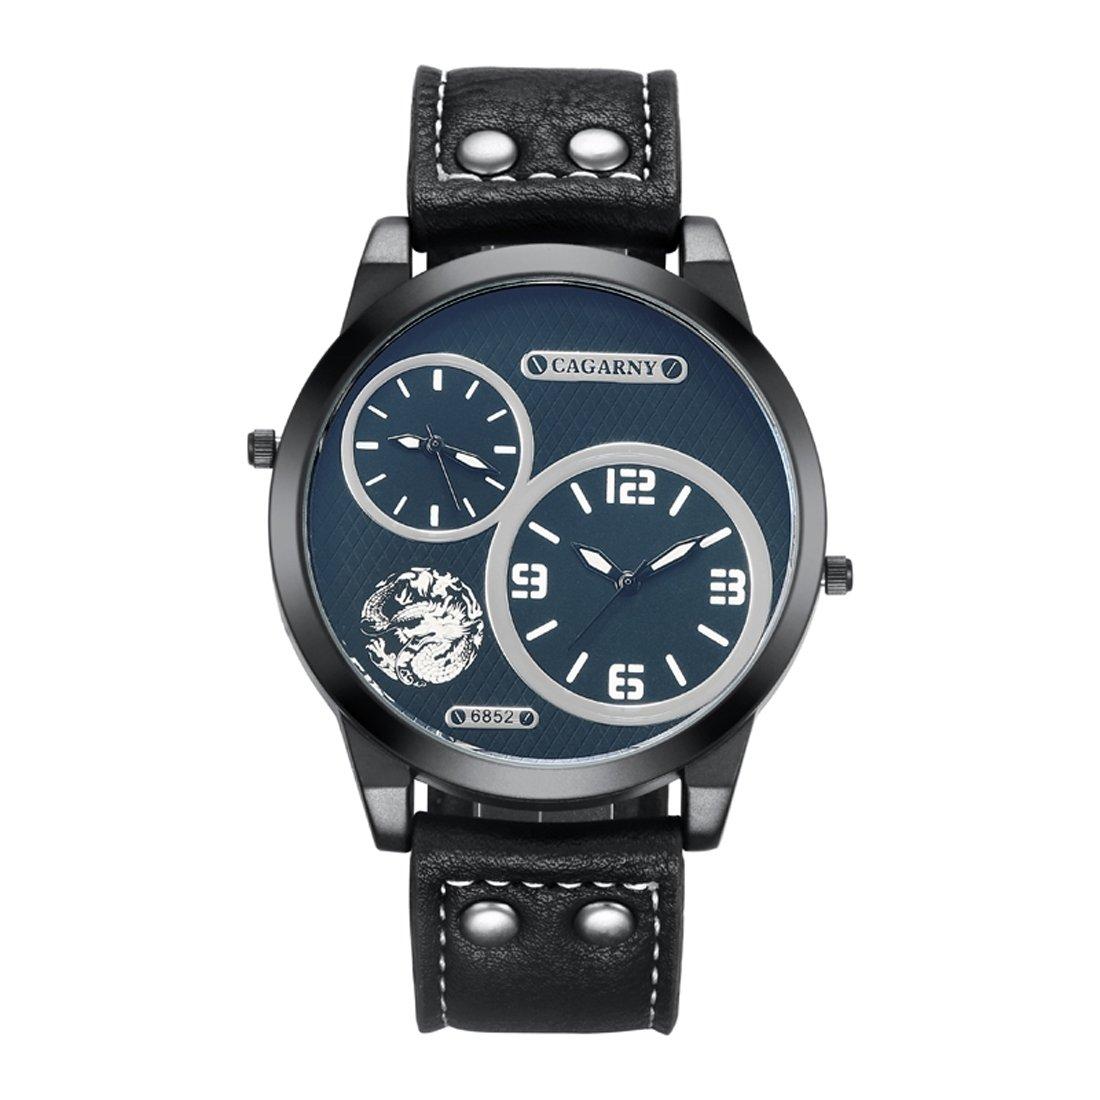 Yaojiaju ファッション防水デュアルクォーツムーブメント腕時計レザーバンド B079GQ539K Wa1025w Wa1025w